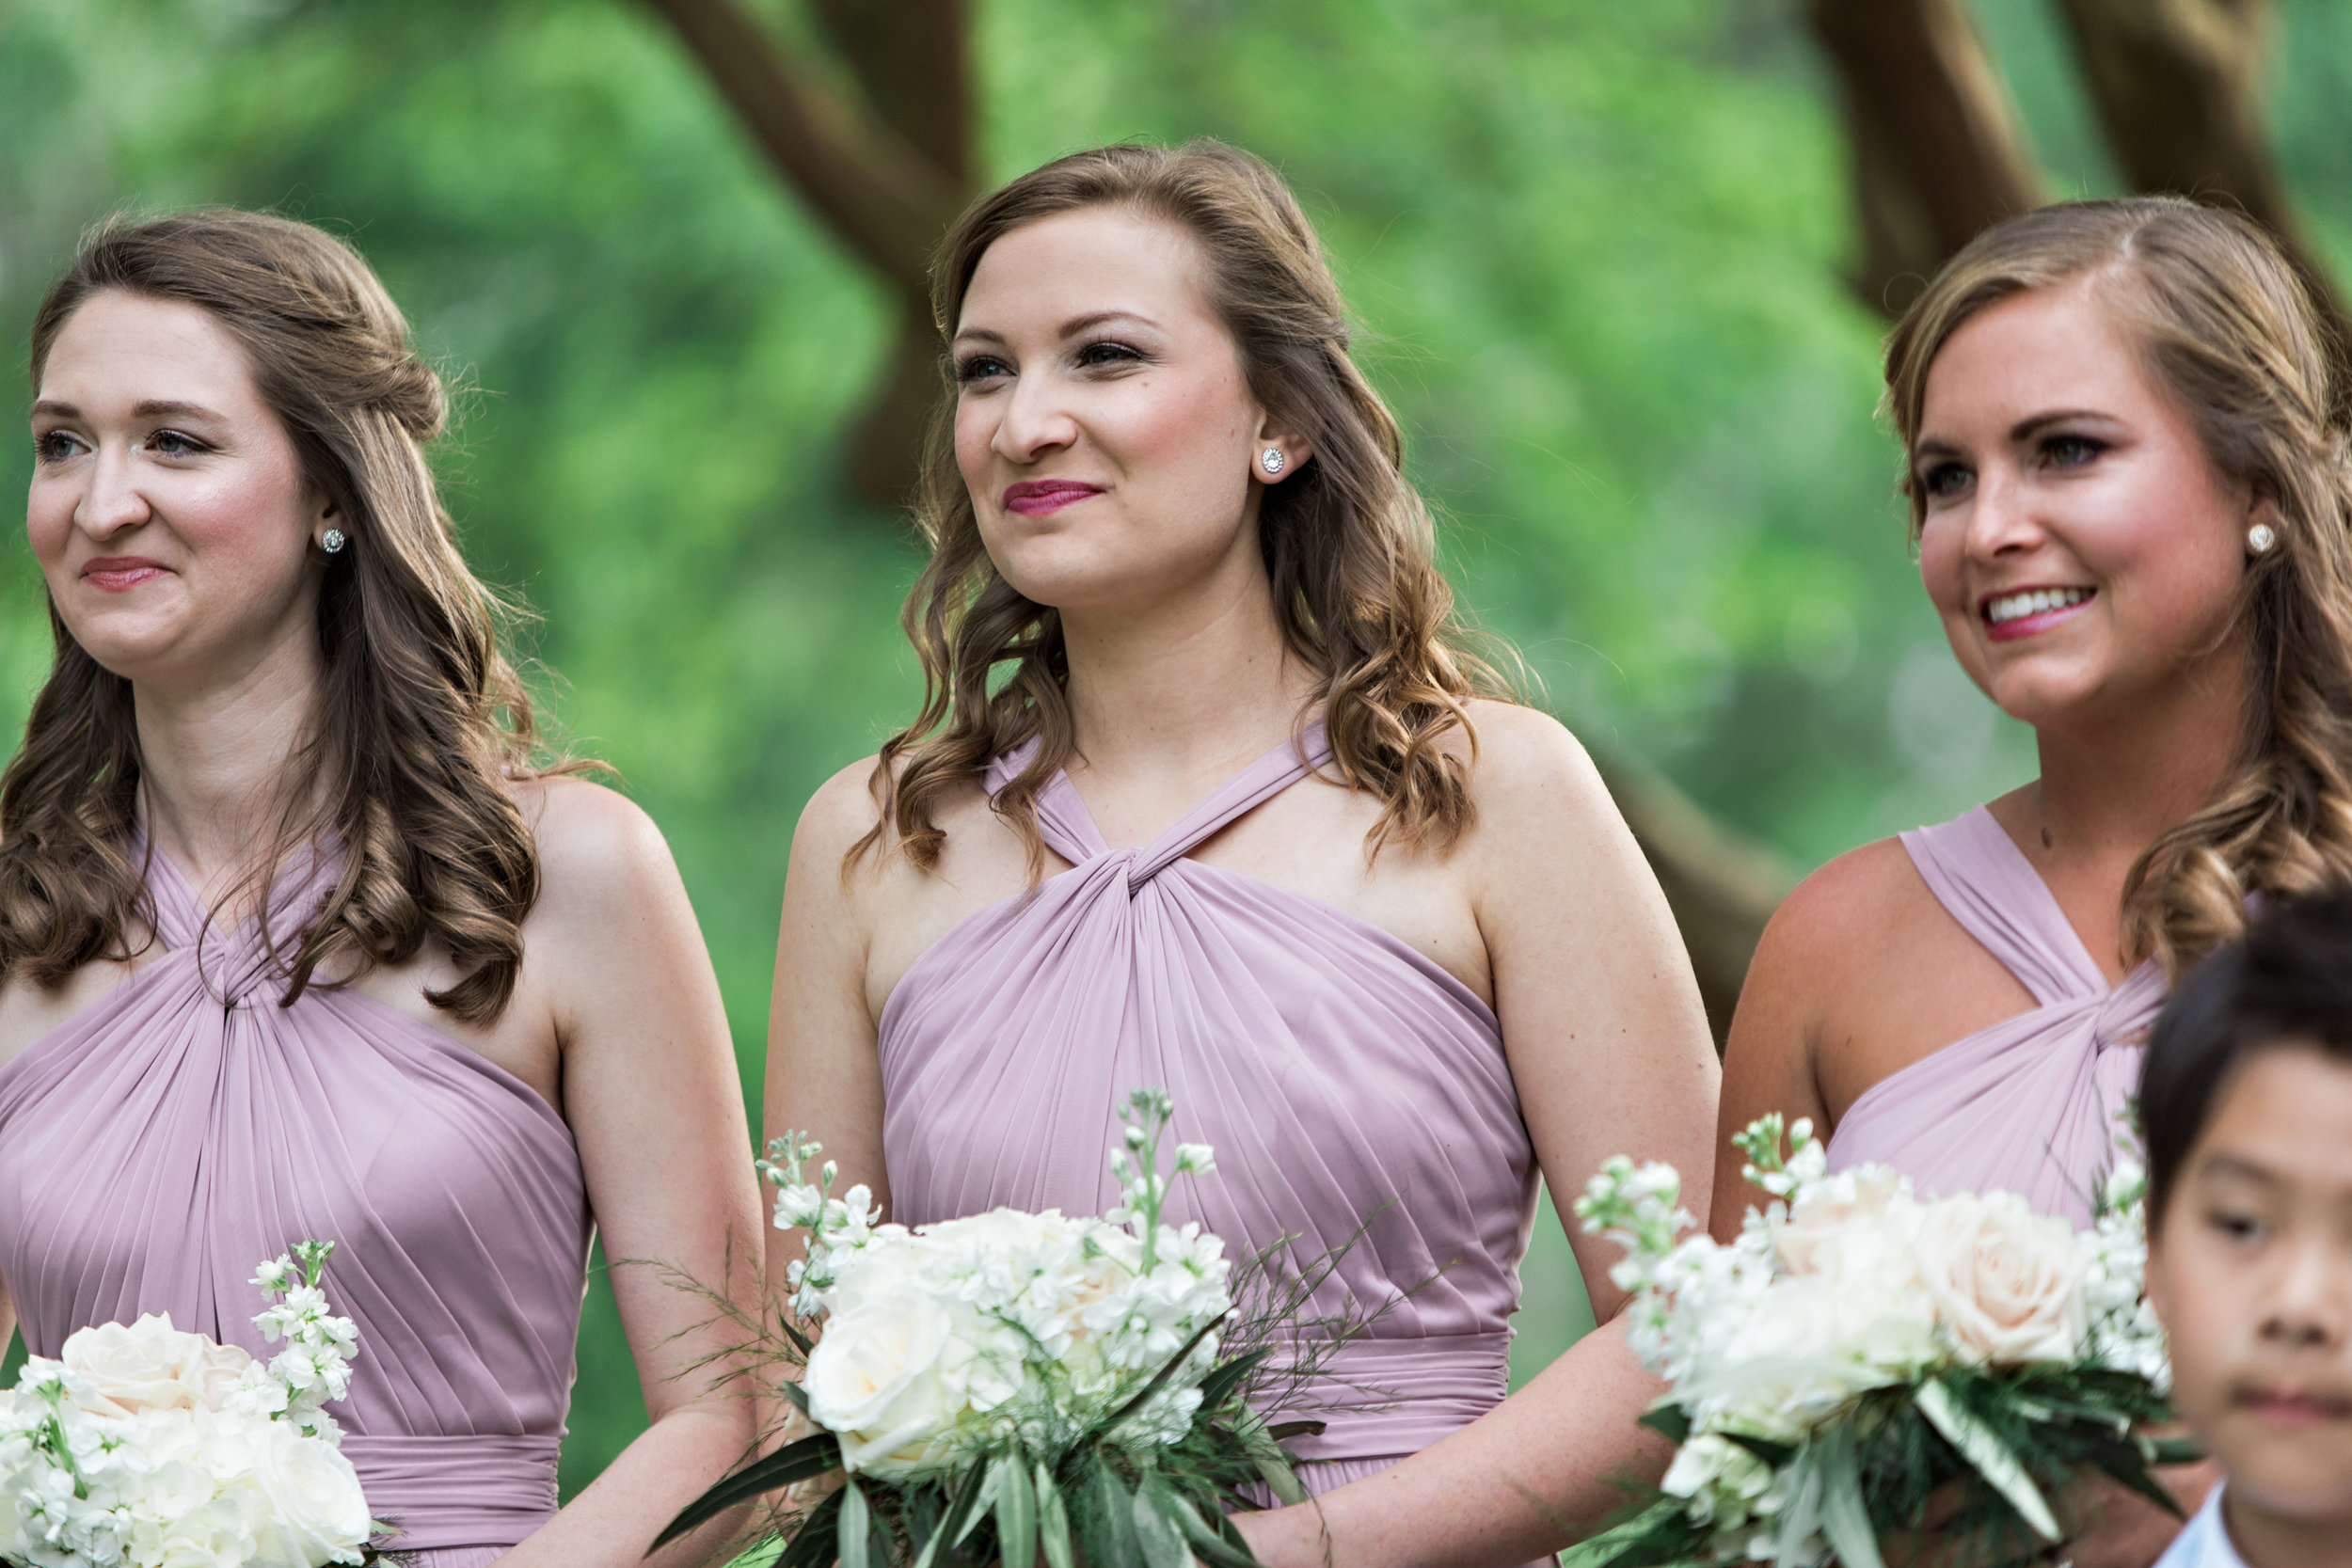 Ni ck-Drollette-Photography-Auburn-Alabama-Weddings-Sylvia-Kevin-146.jpg